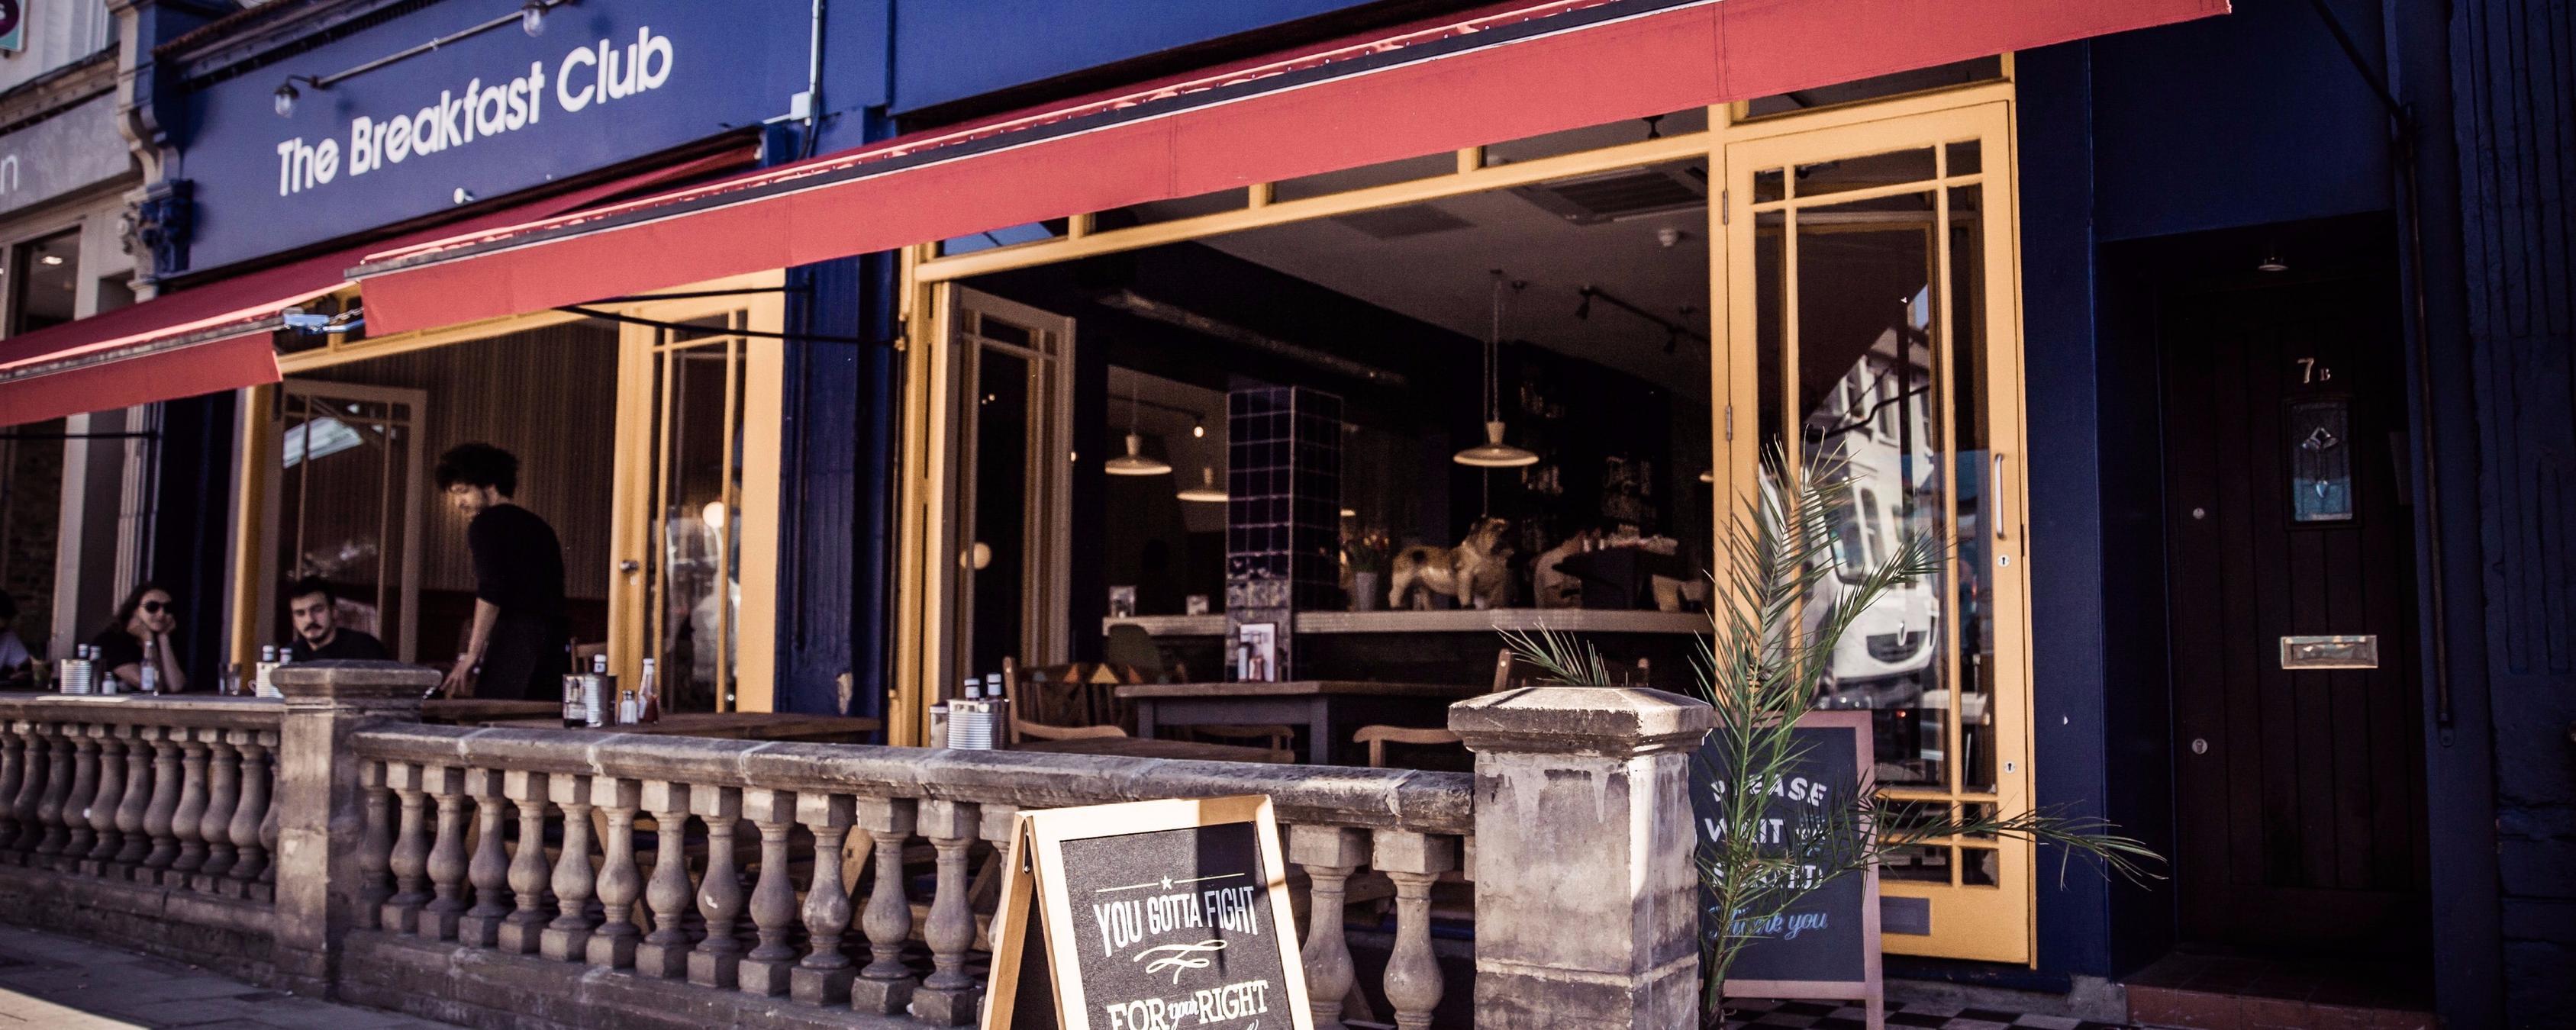 The Breakfast Club - Battersea & The Breakfast Pub Brand Cover